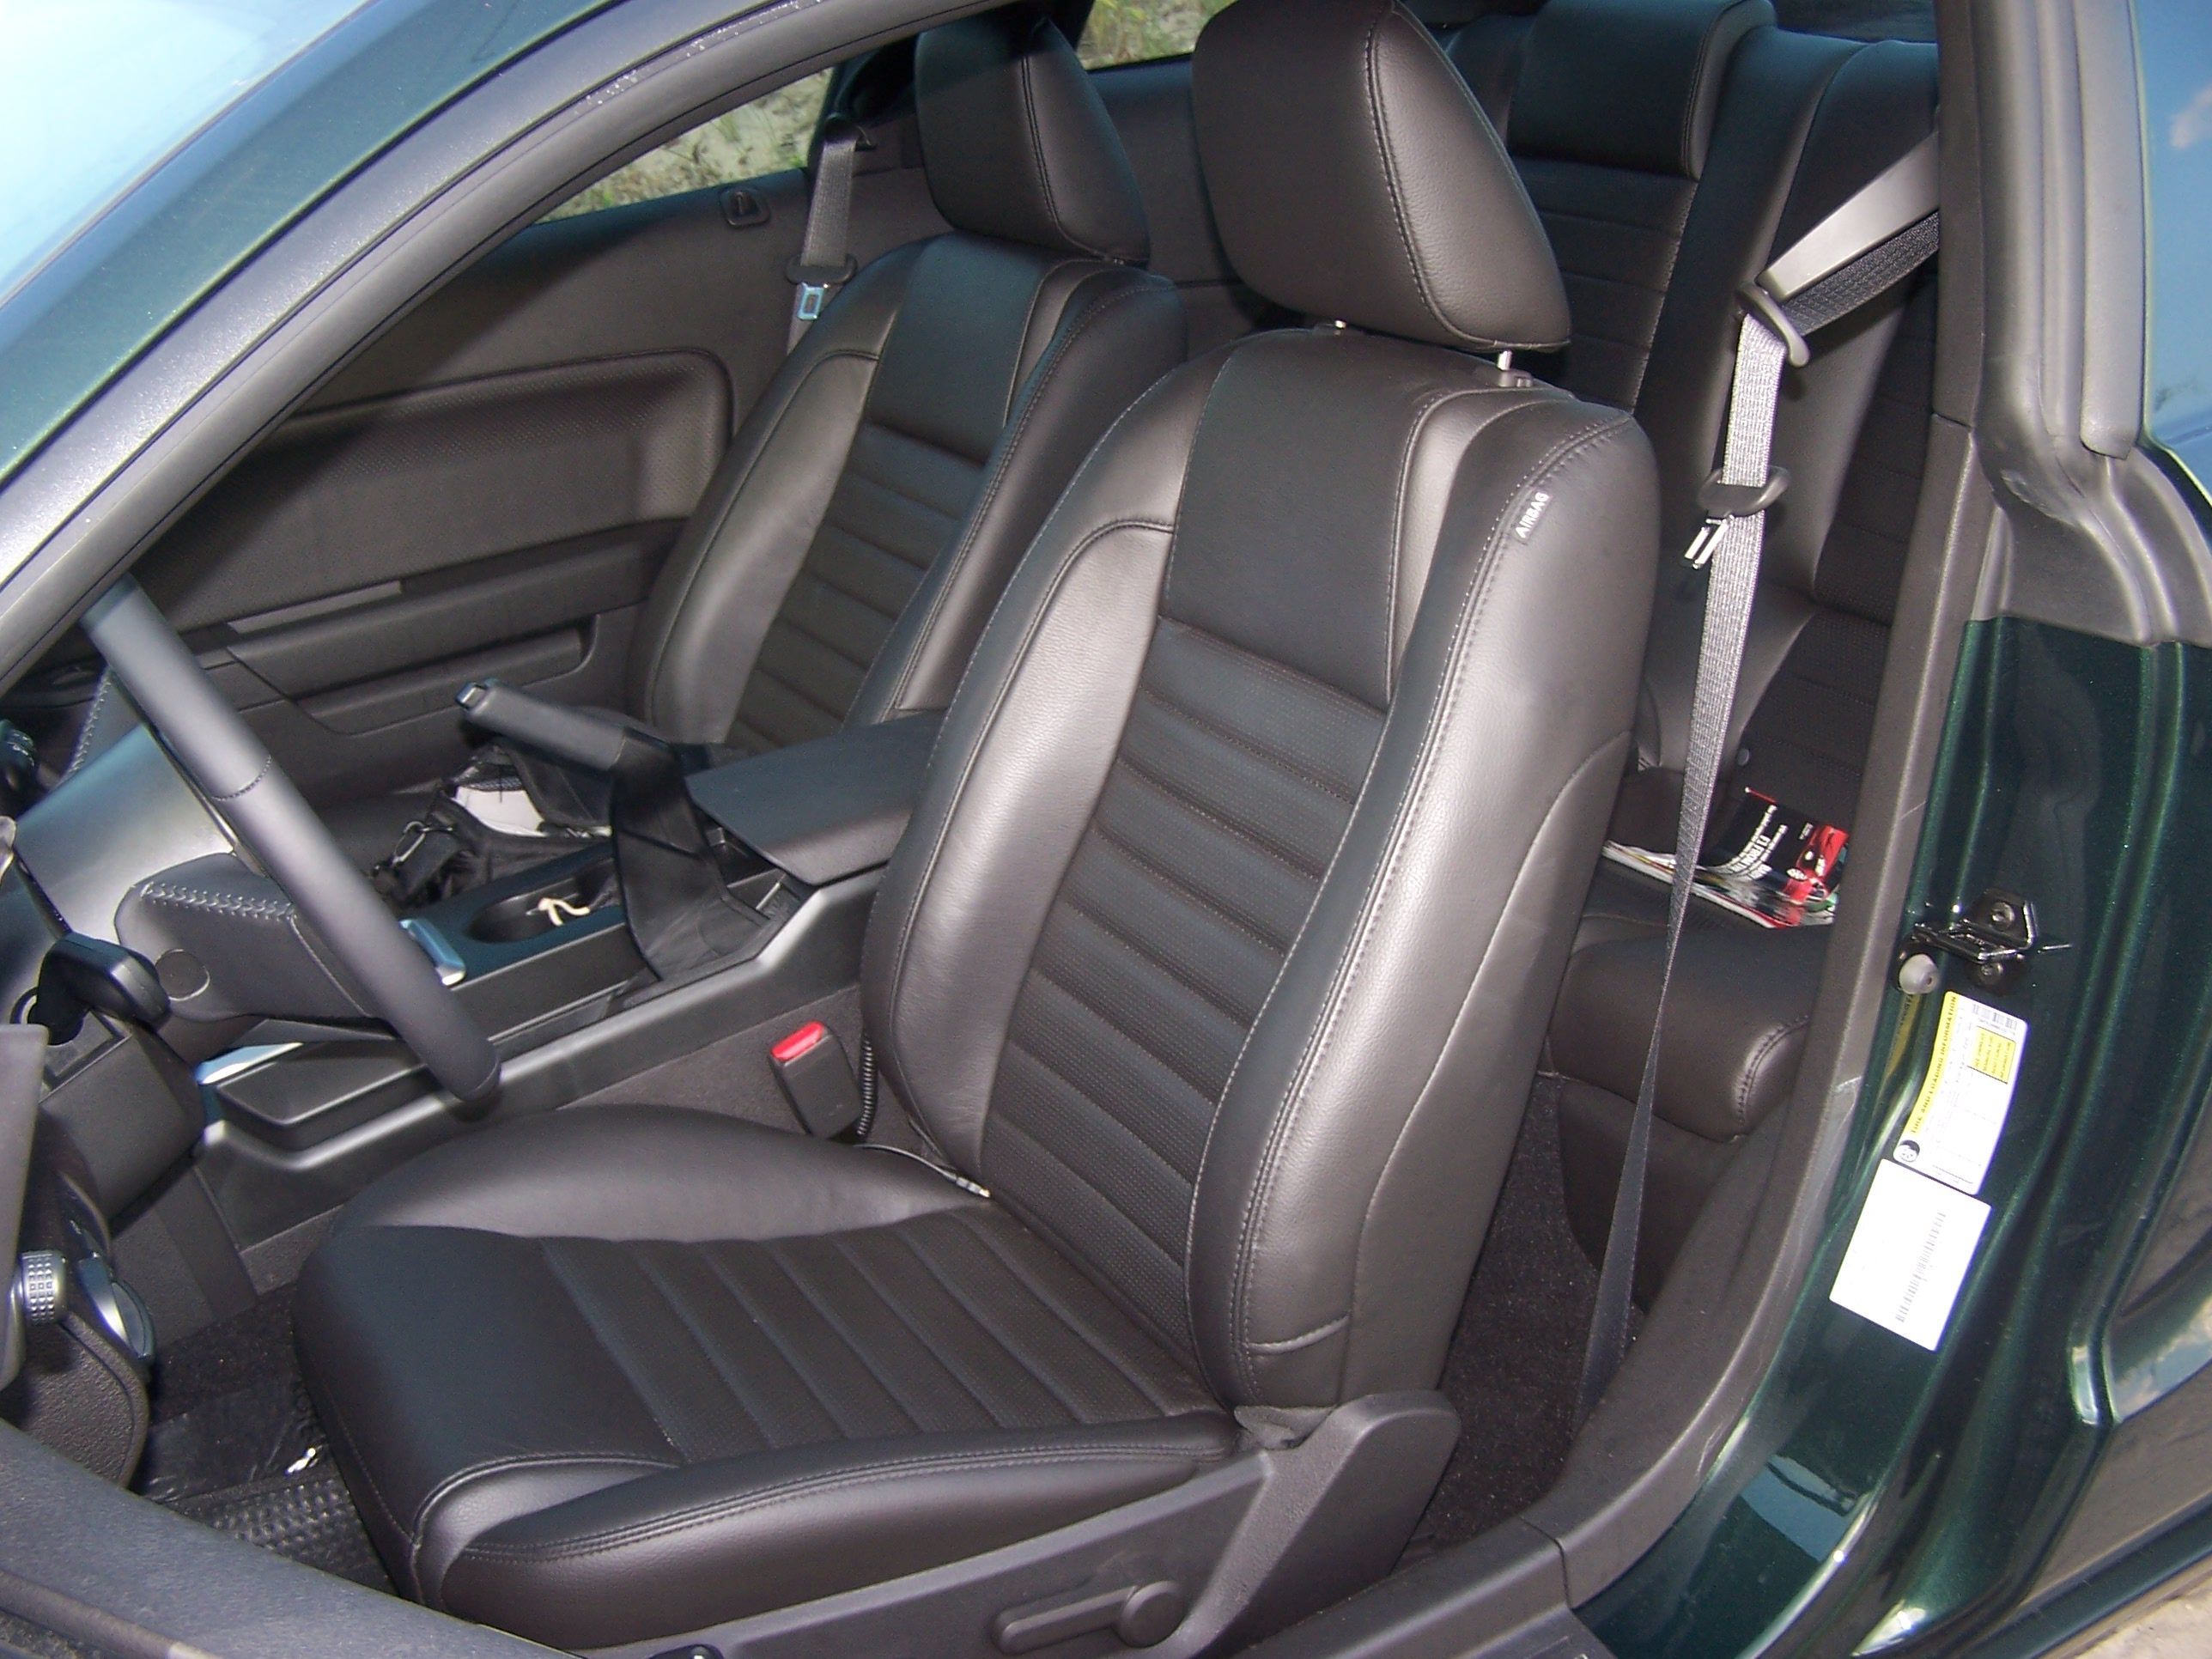 Image Gallery 2010 Mustang Seats